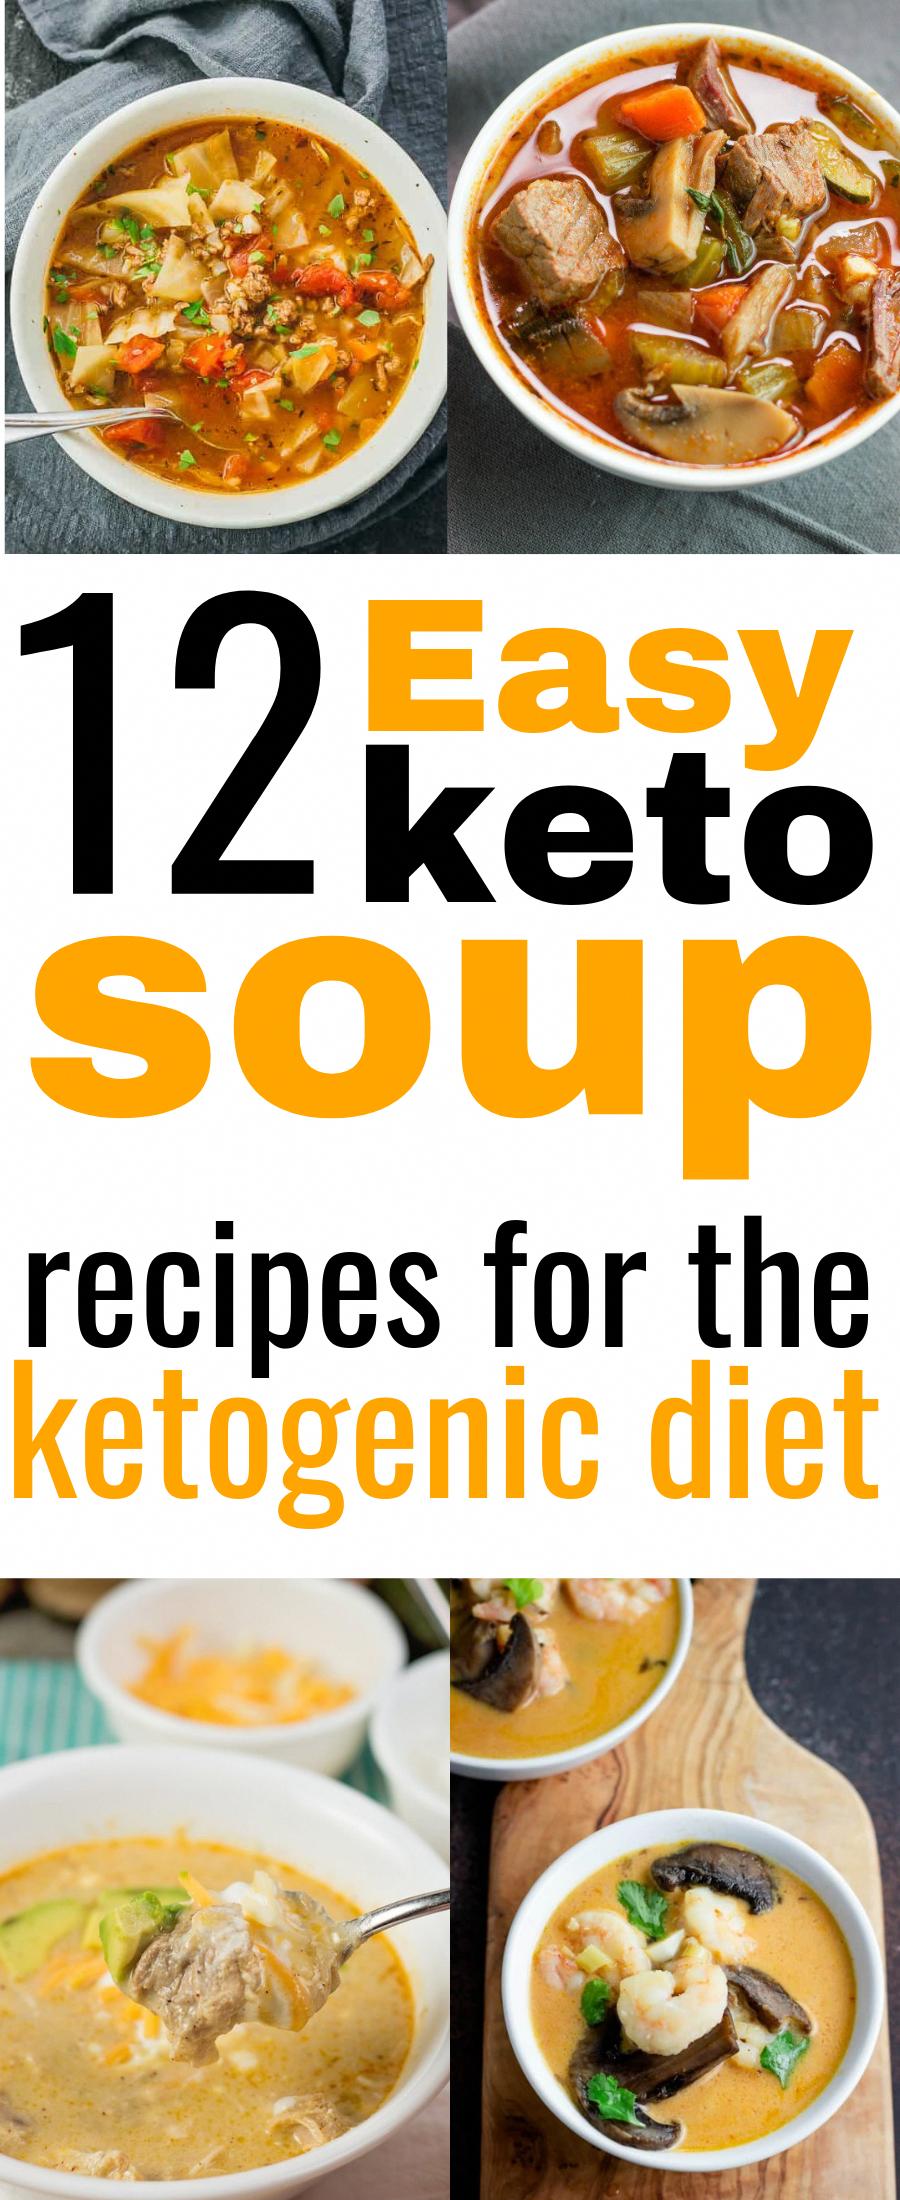 Keto Diet Recipes For Beginners Vegetarians